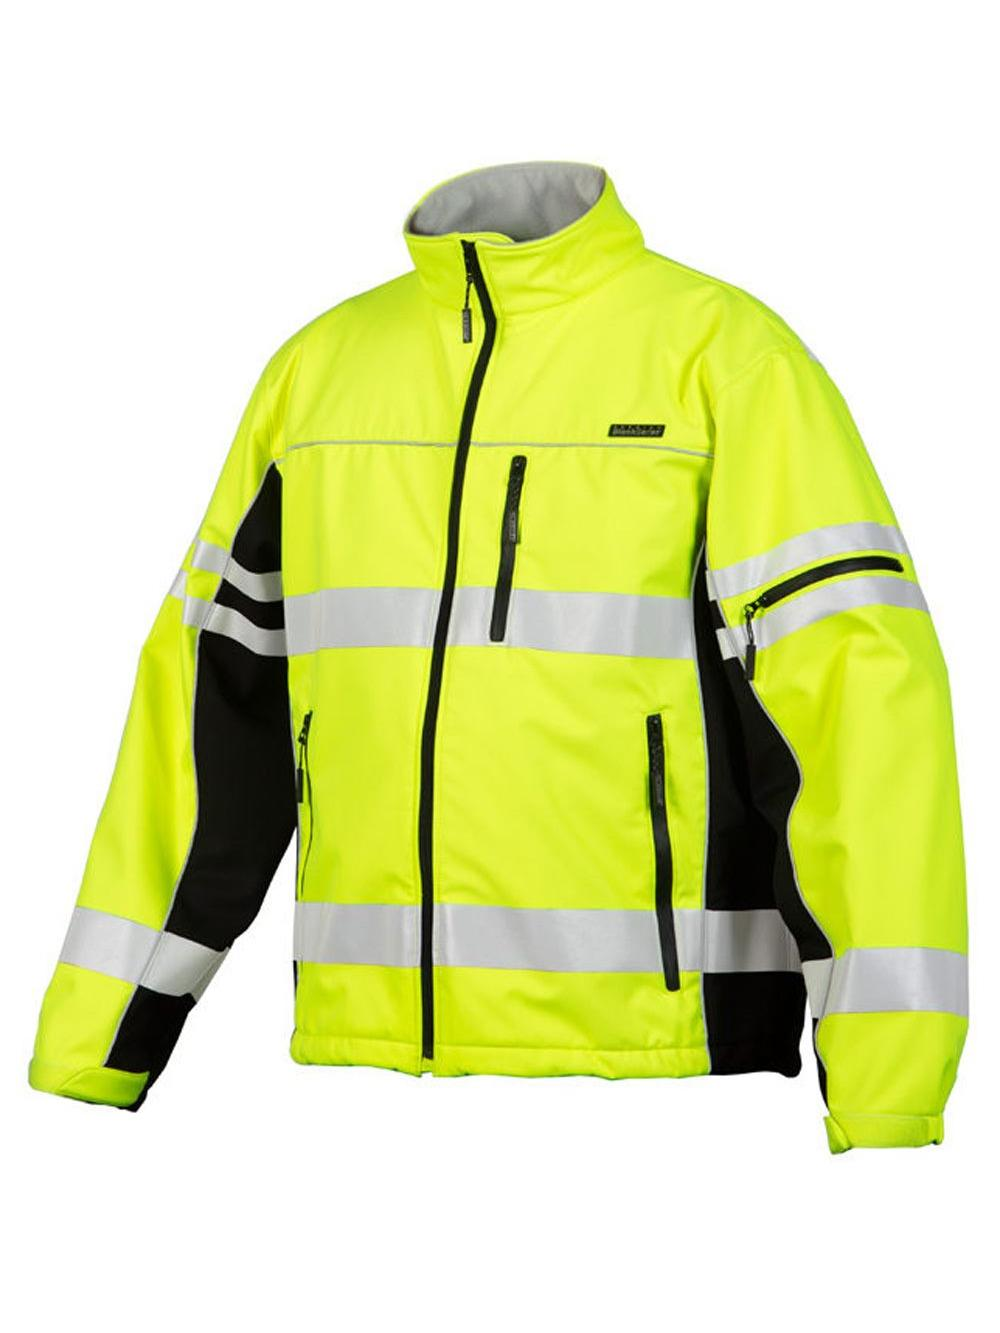 ML Kishigo Outerwear Soft Shell Jacket